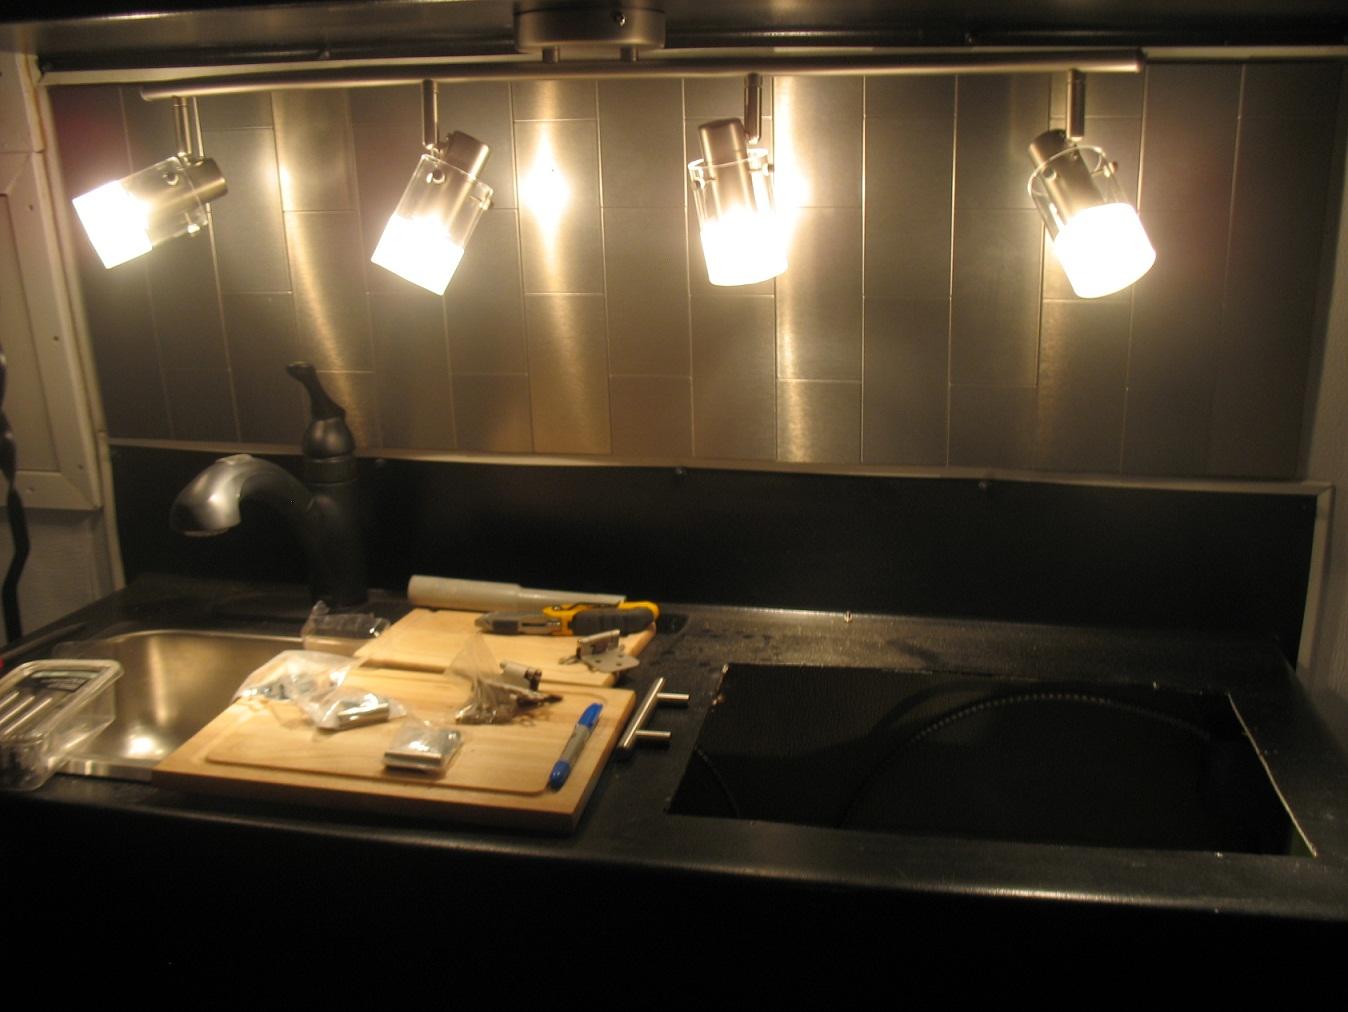 new kitchen backsplash cabinets fiberglass rv